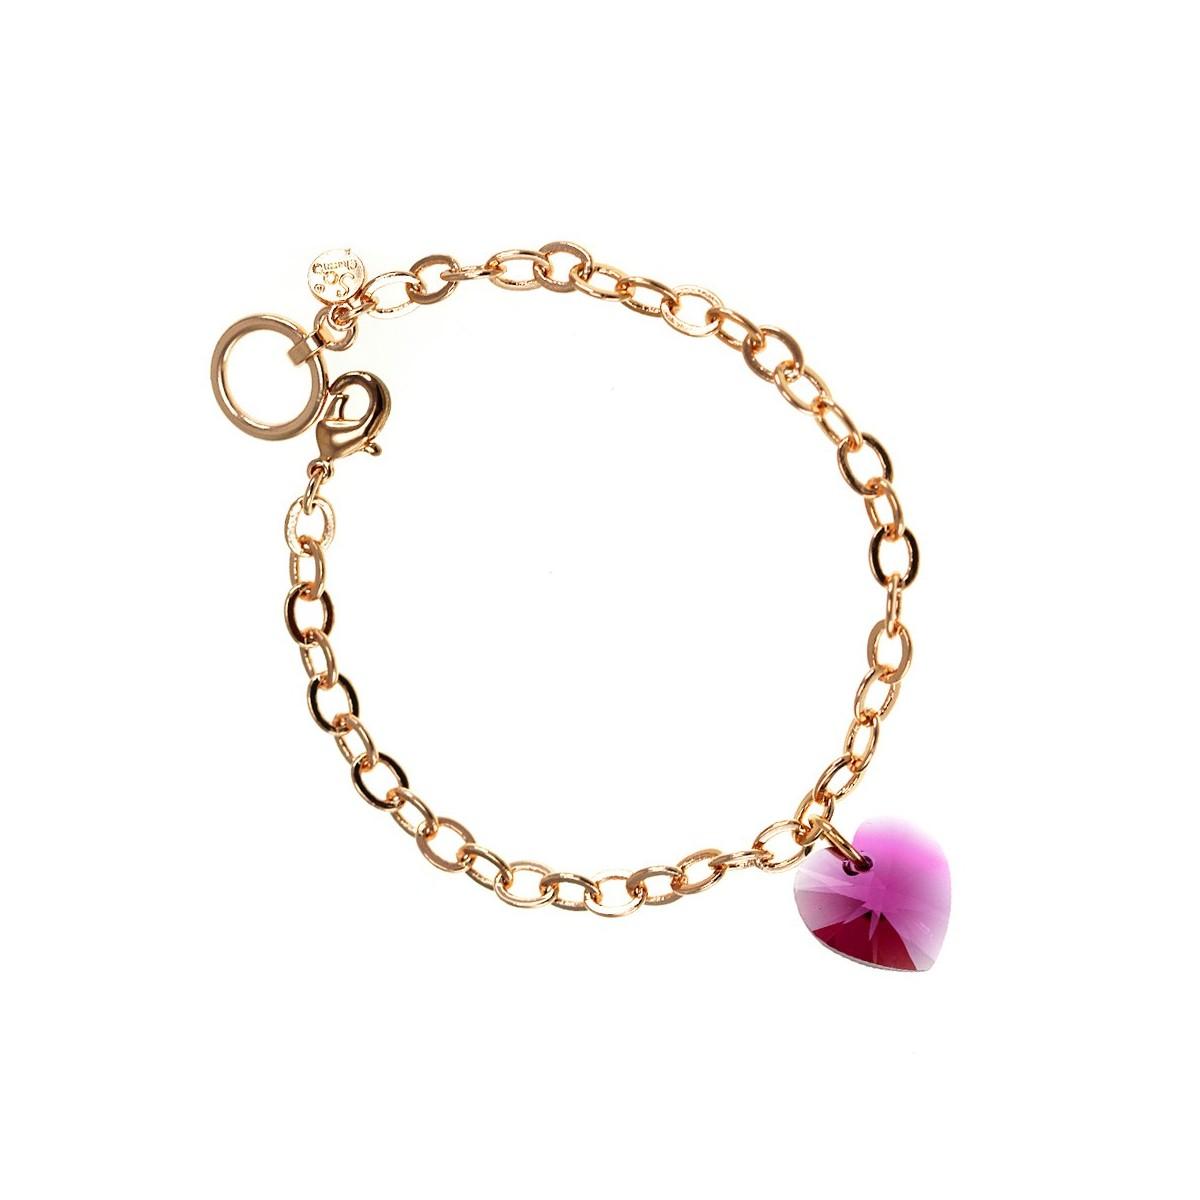 Bracelet plaqué or rose et coeur rose So Charm made with crystal from Swarovski